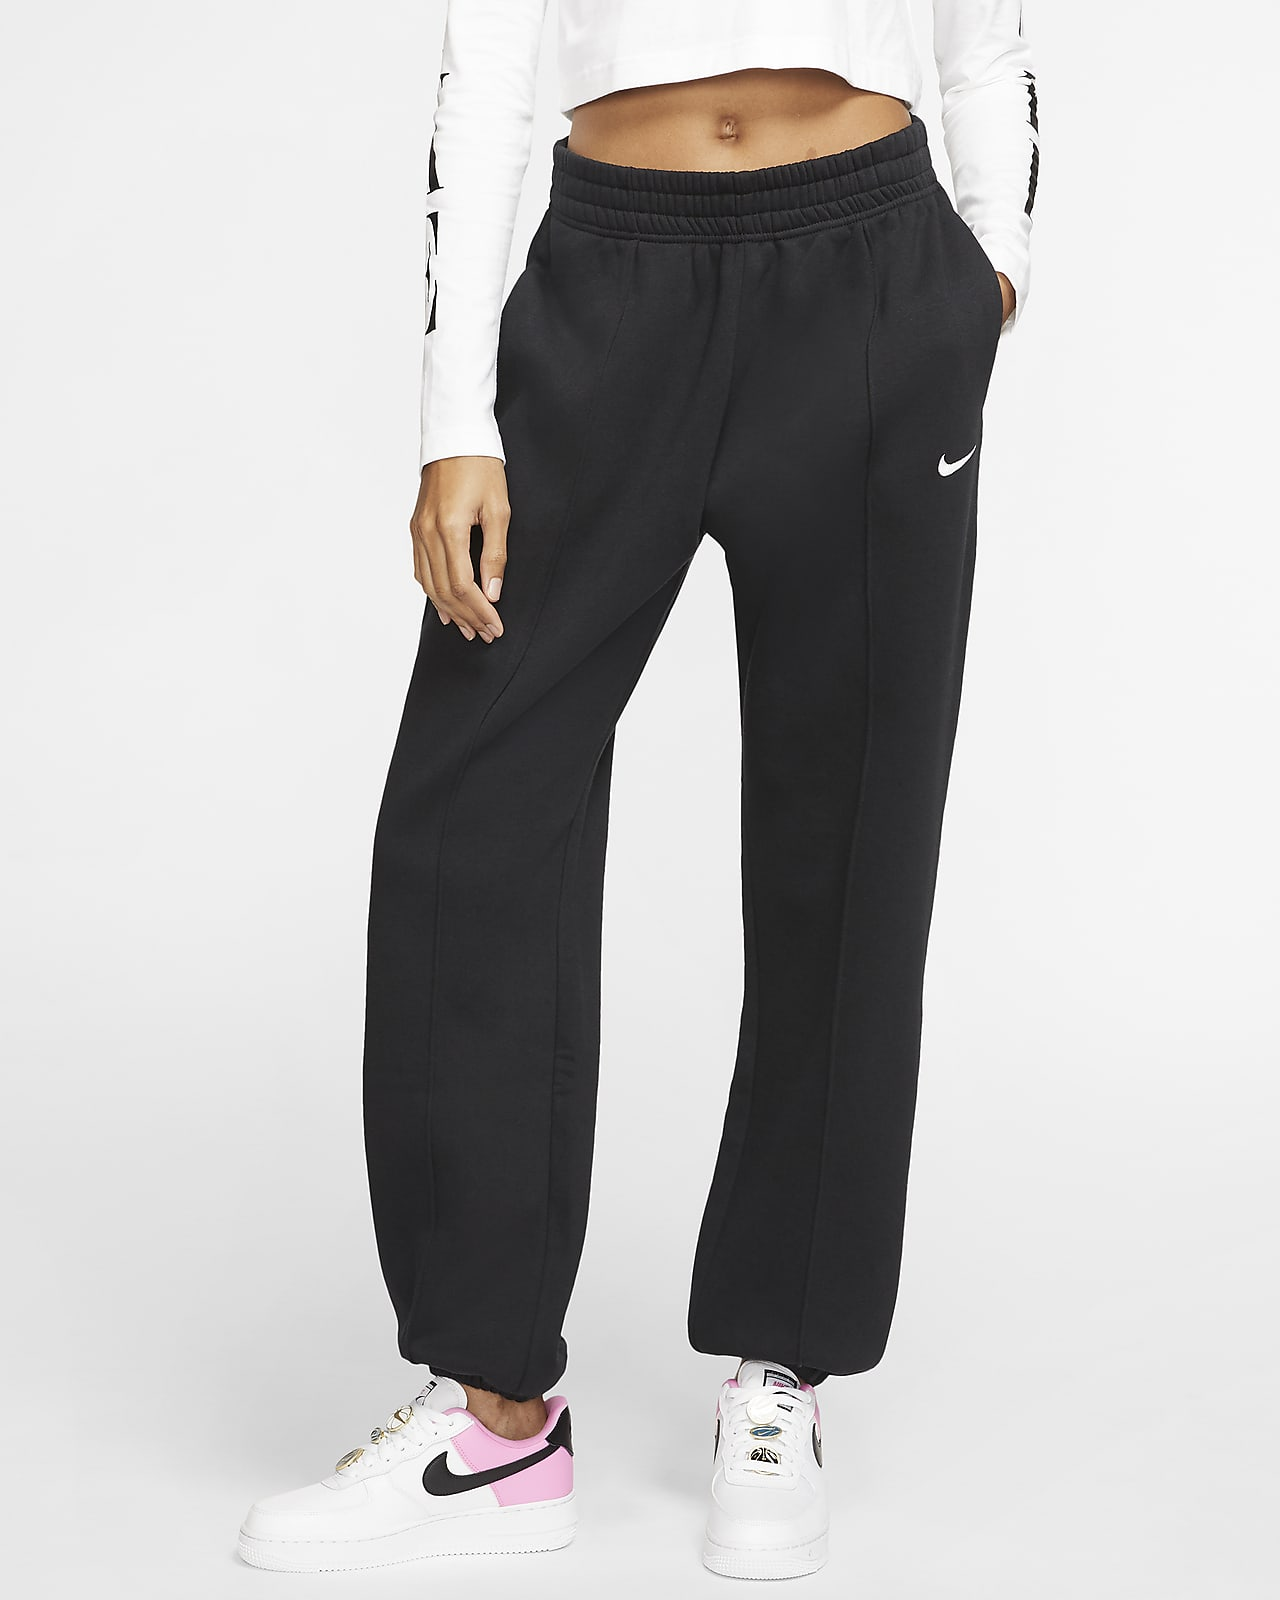 Nike Sportswear Essential Collection Pantalón de tejido Fleece - Mujer